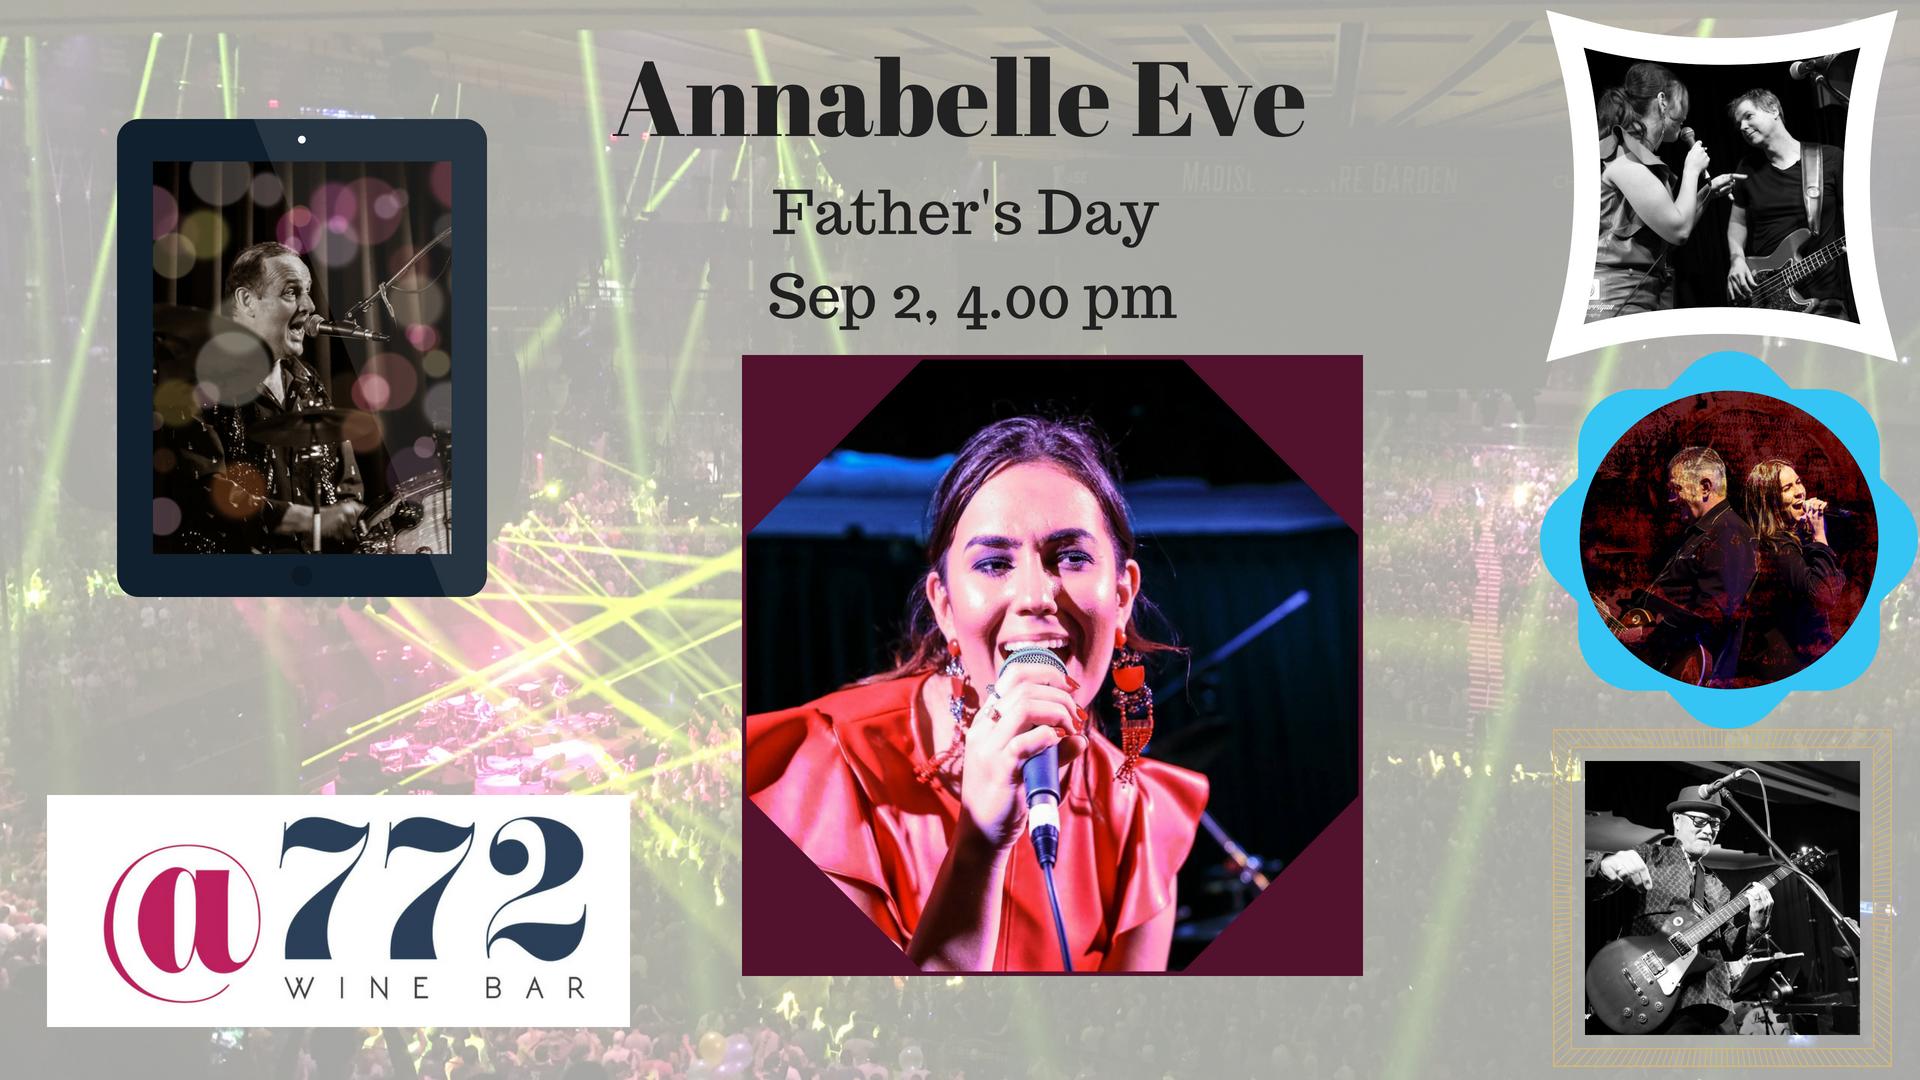 4pm - 7pm - Annabelle Eve